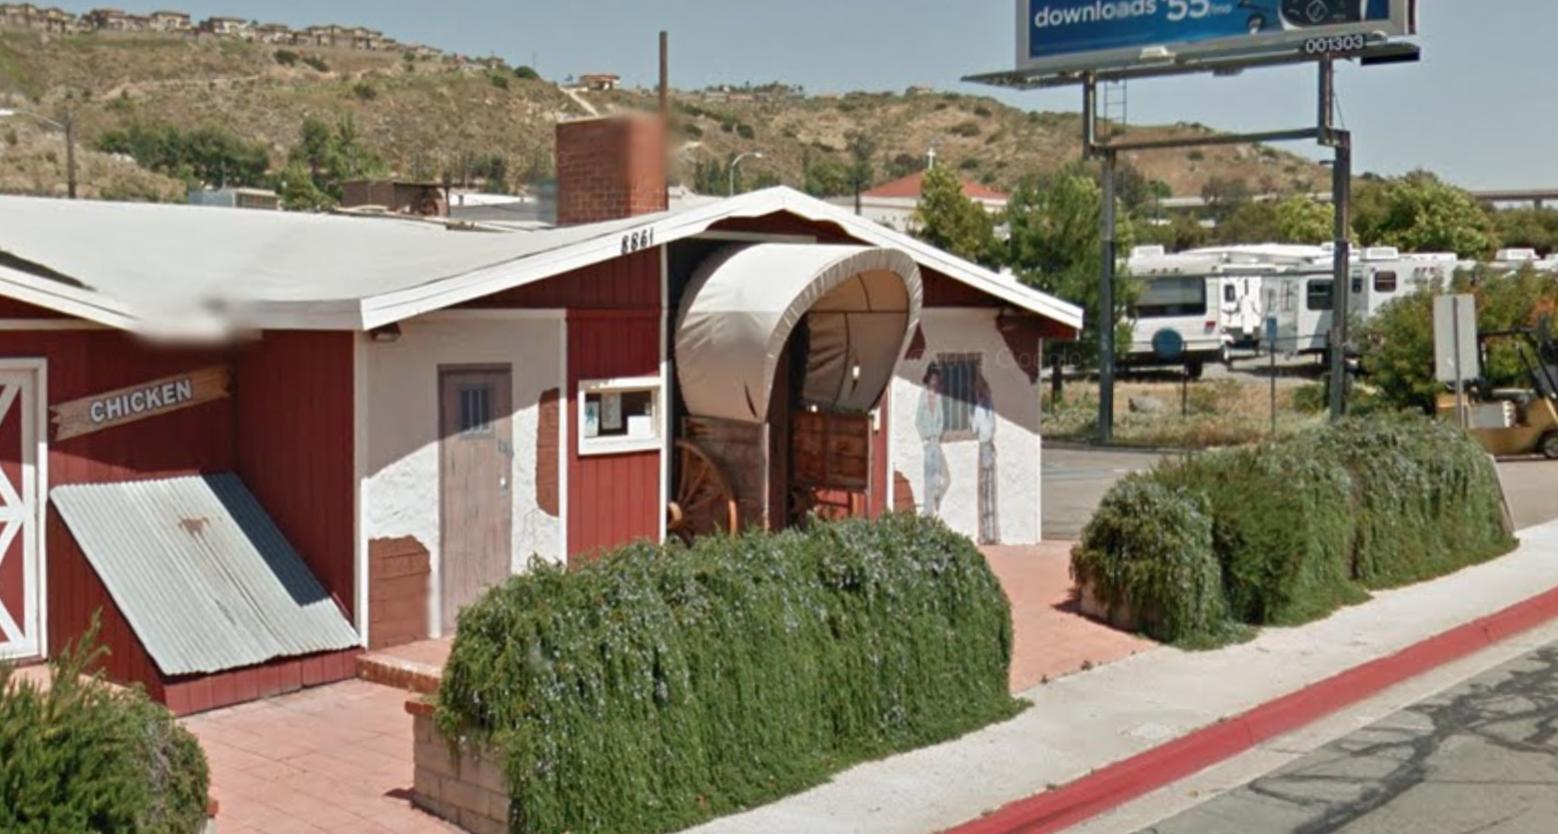 Western Mural Wagon Wheel Restaurant exterior Santee California 4.png